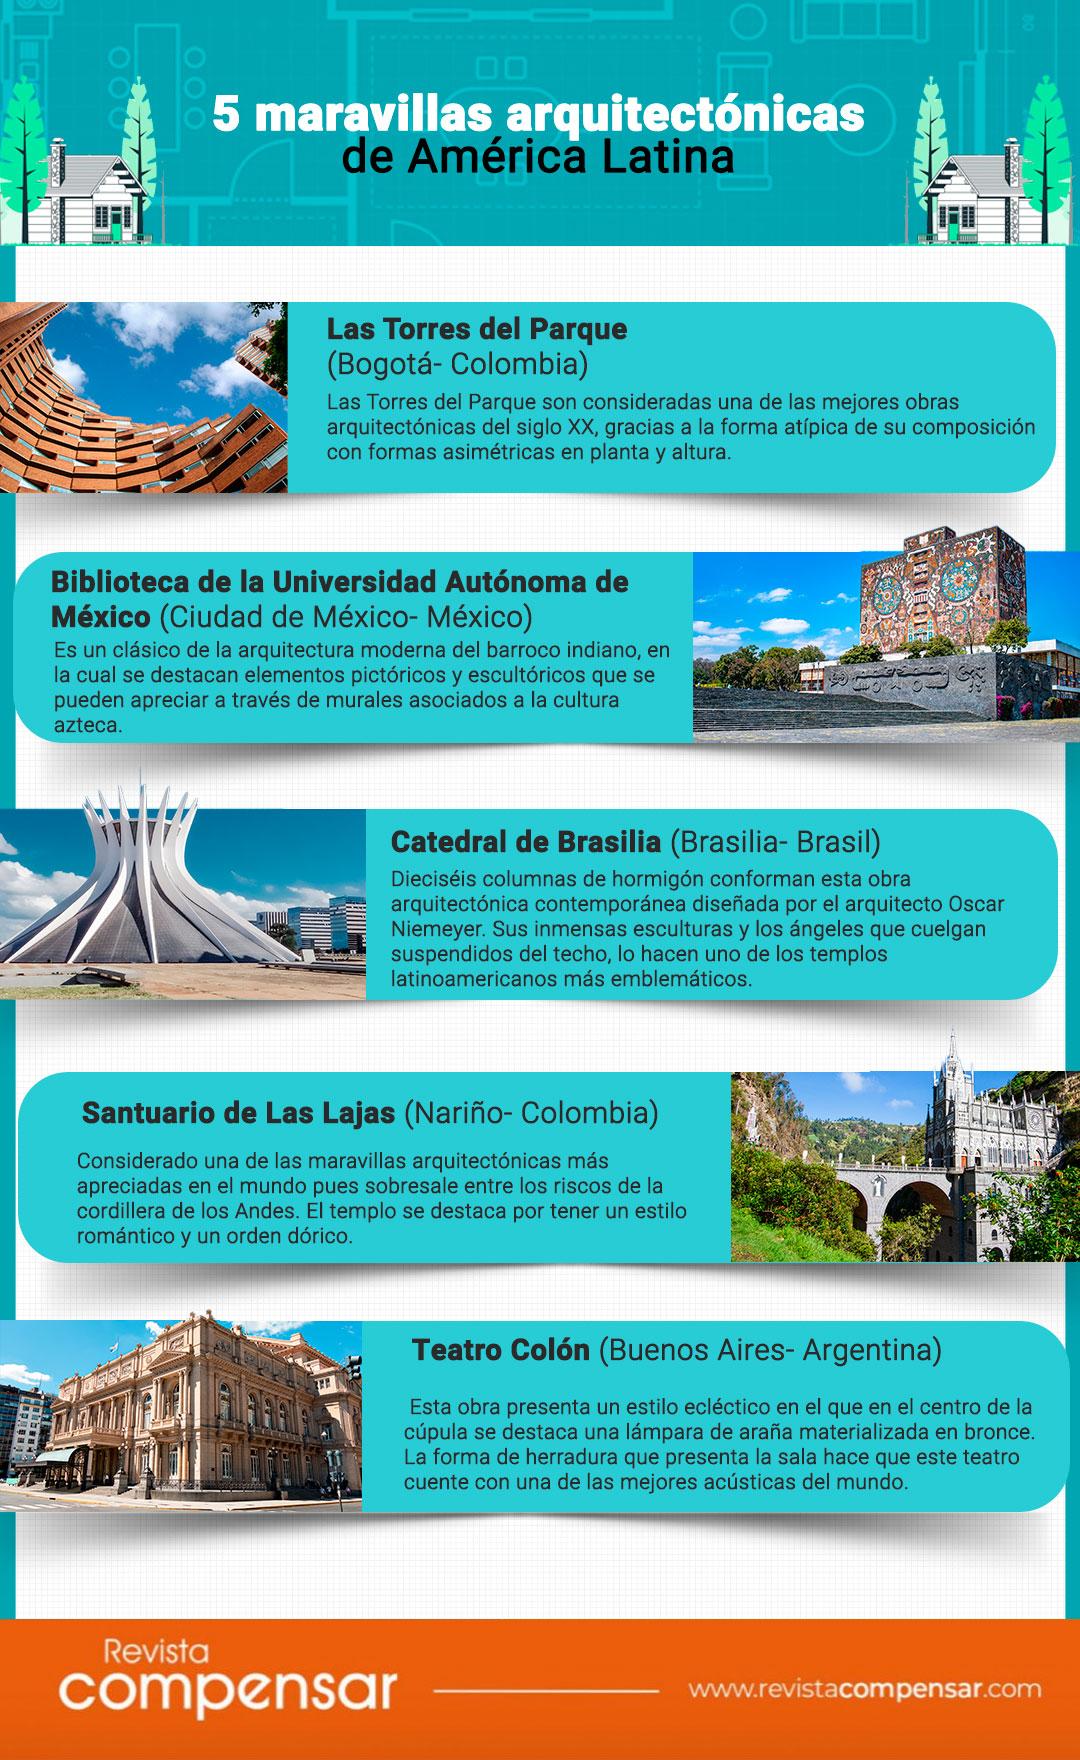 5 grandes obras arquitectónicas